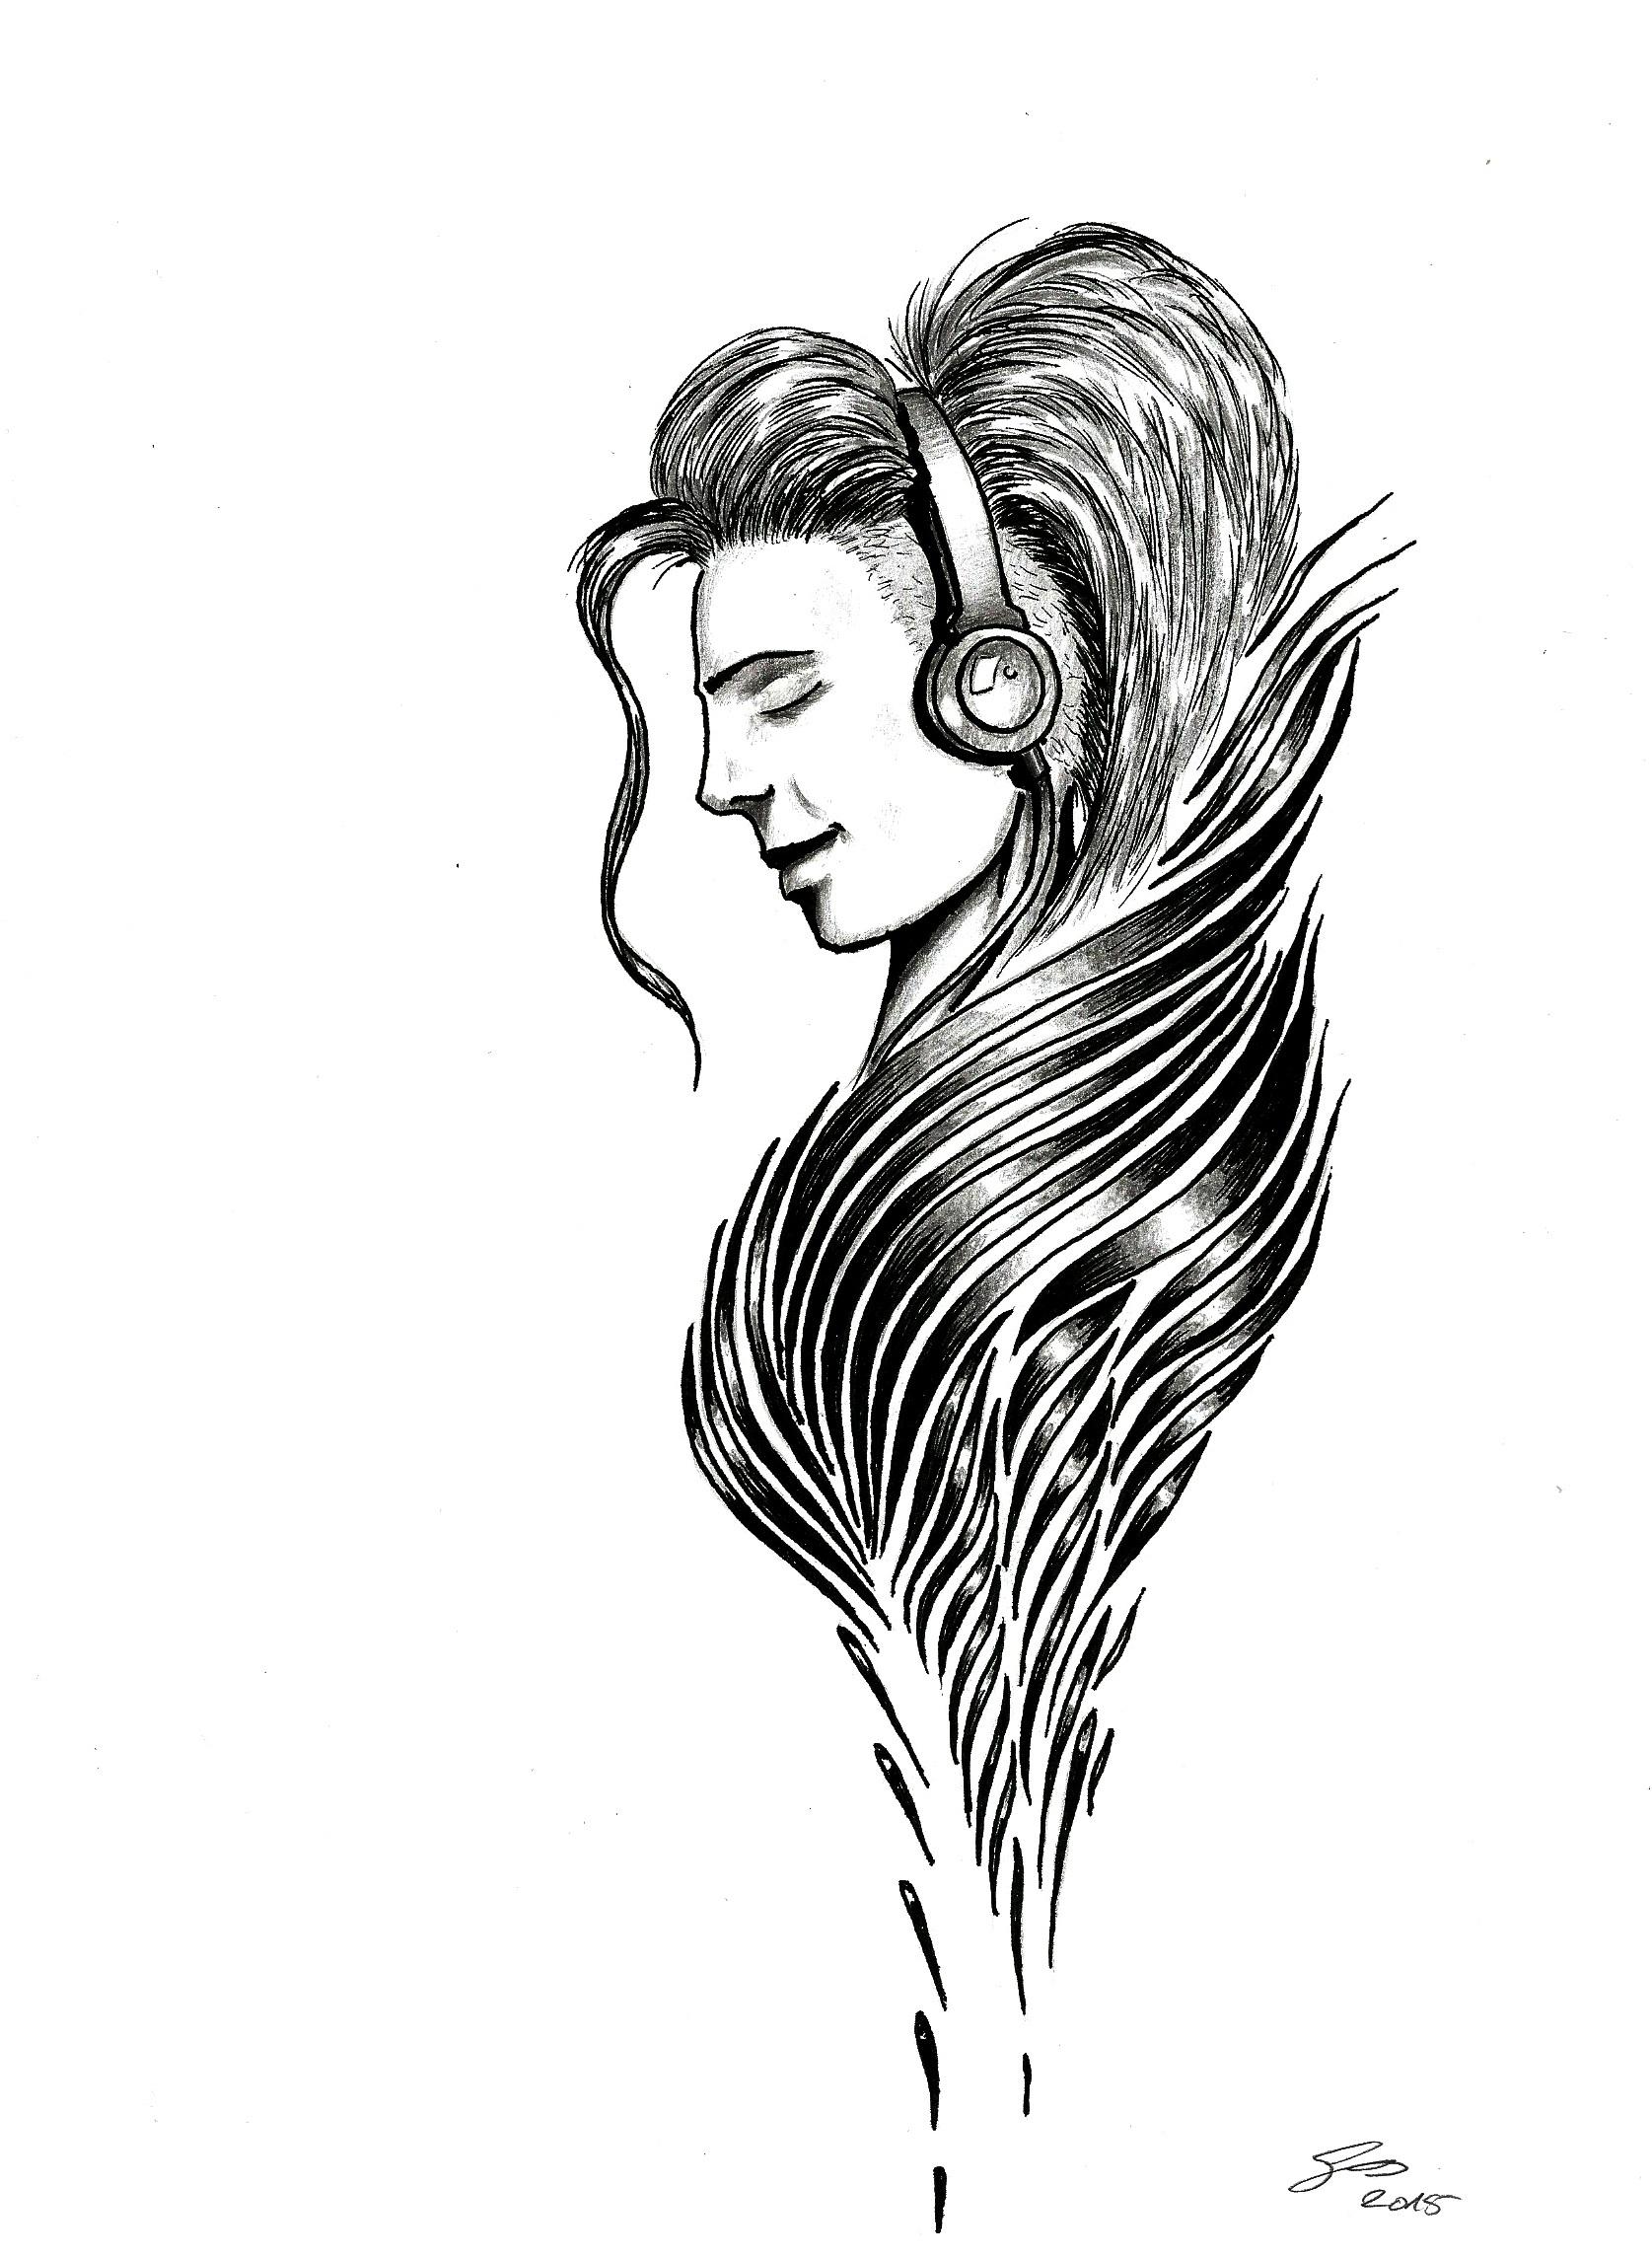 Tattoo sidneyoliverbrehm Cool designs for girls